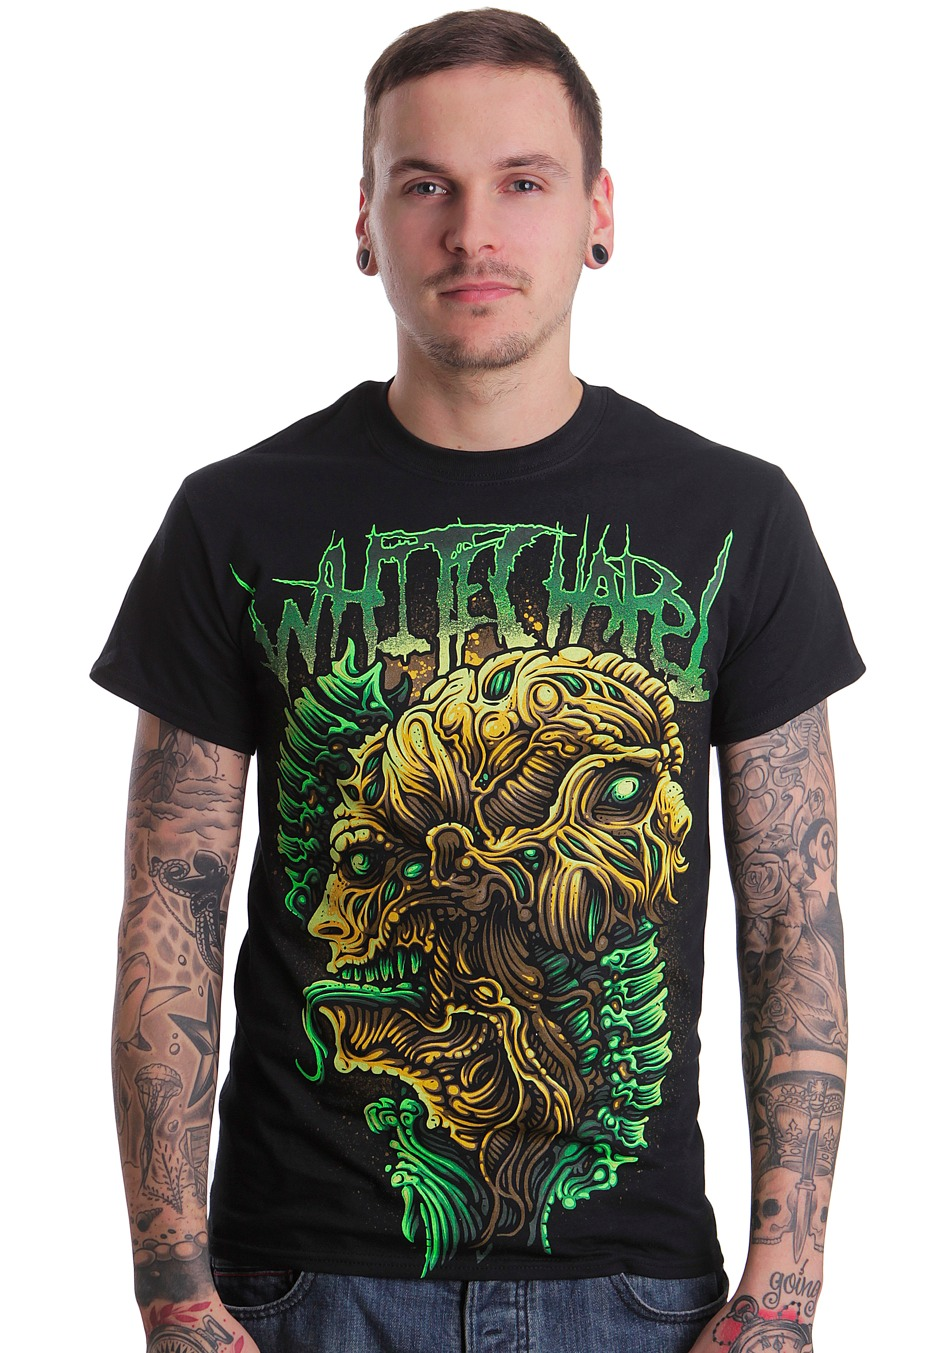 Whitechapel - Anatomy - T-Shirt - Impericon.com Worldwide